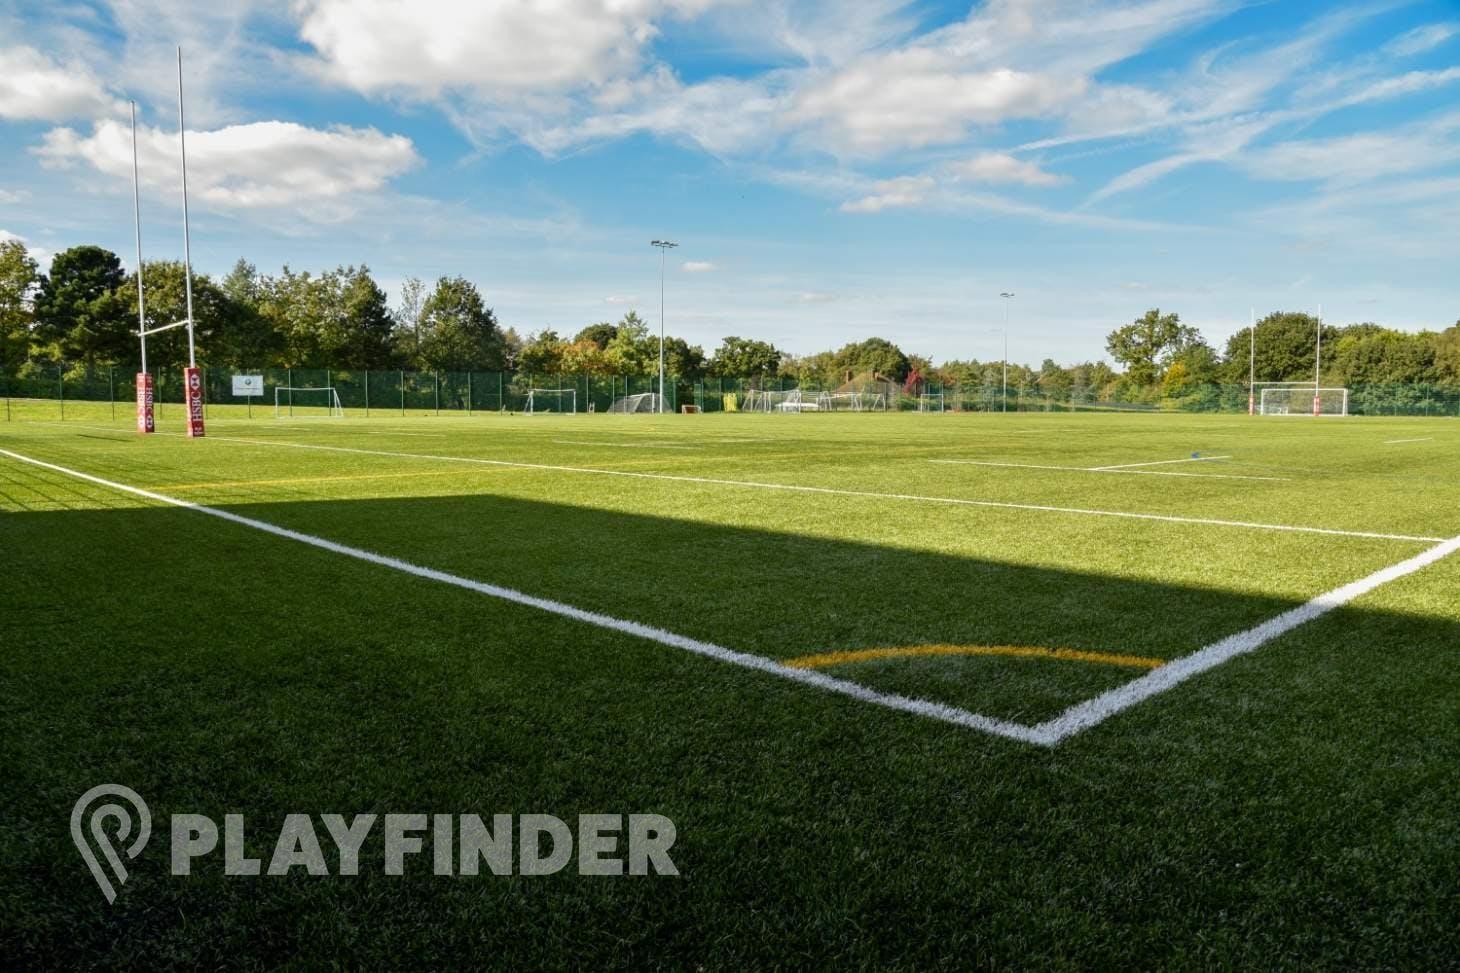 Ravens Wood School 7 a side | 3G Astroturf football pitch